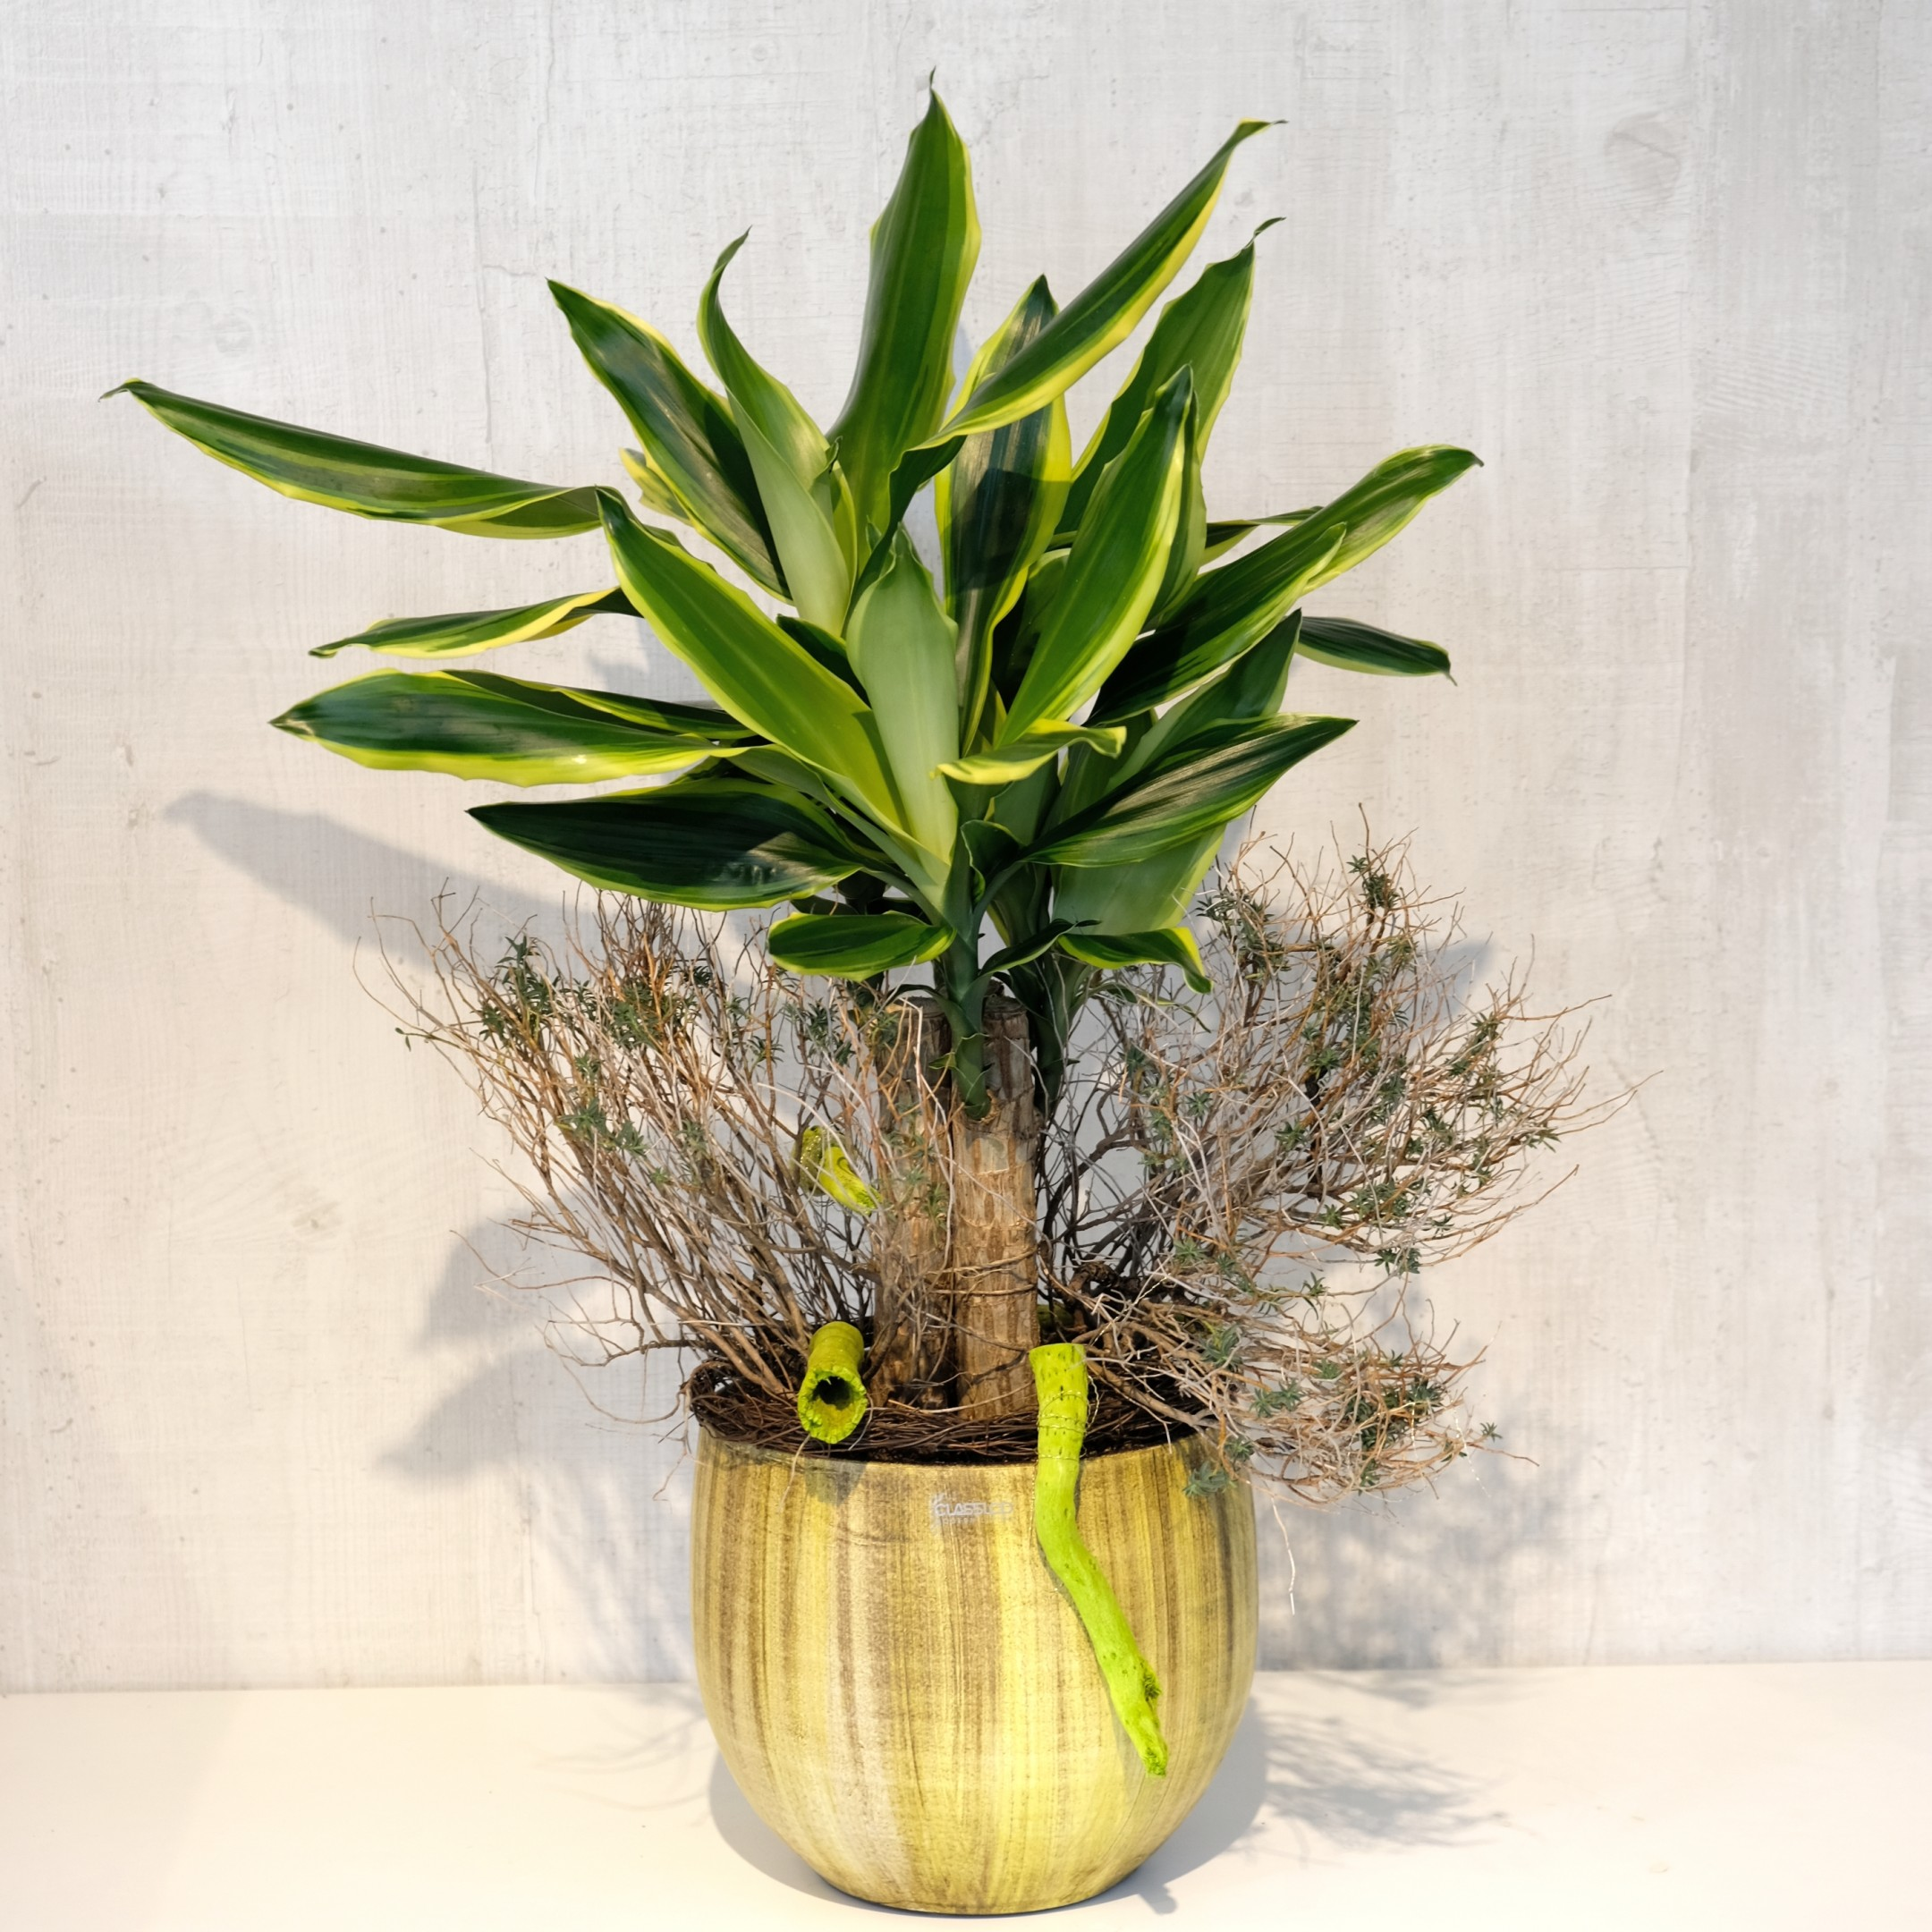 Grünpflanze Bild 1